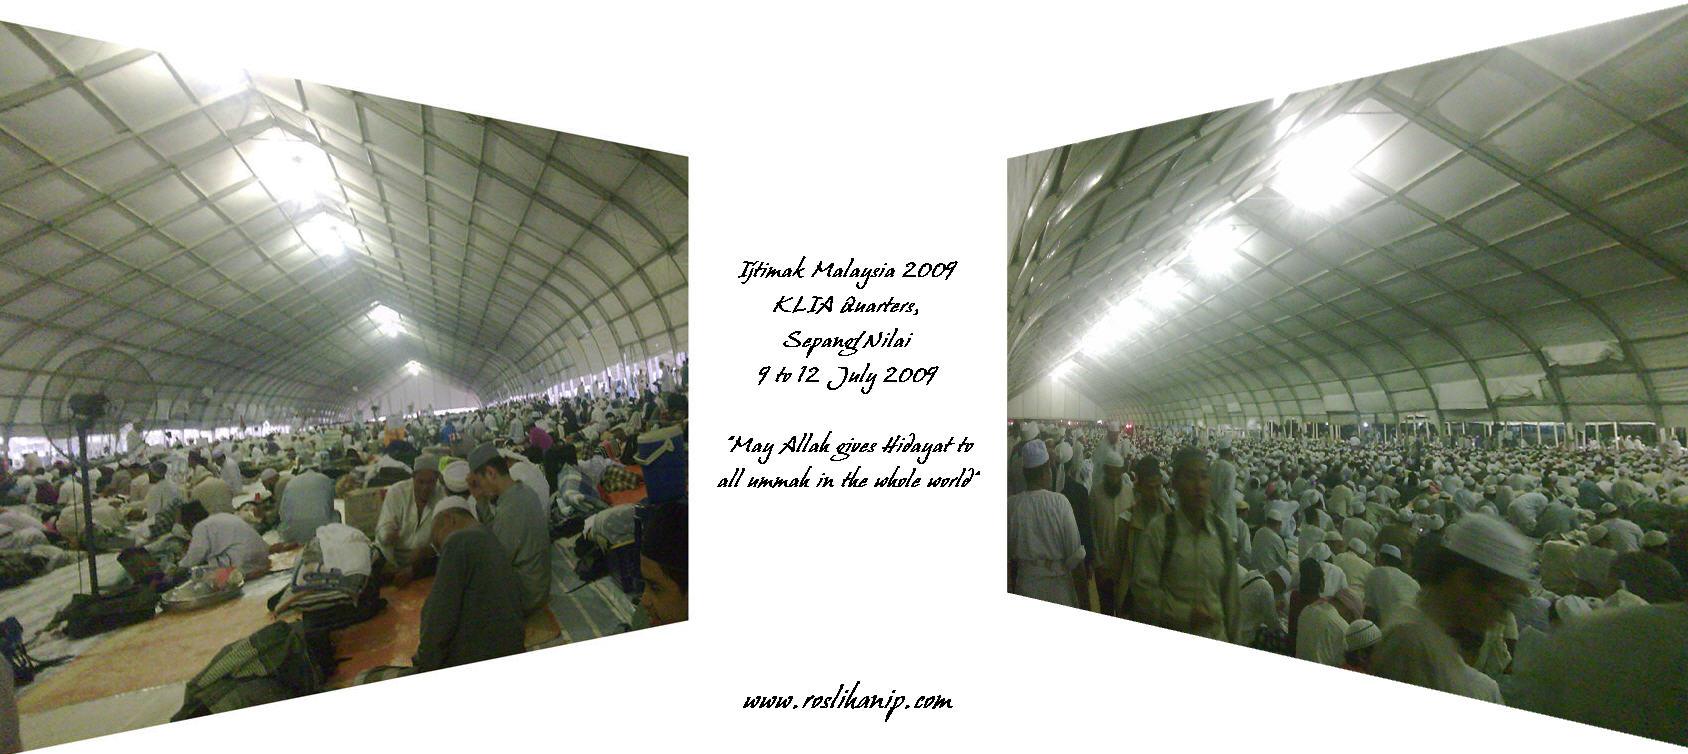 Ijtimak Malaysia 2009